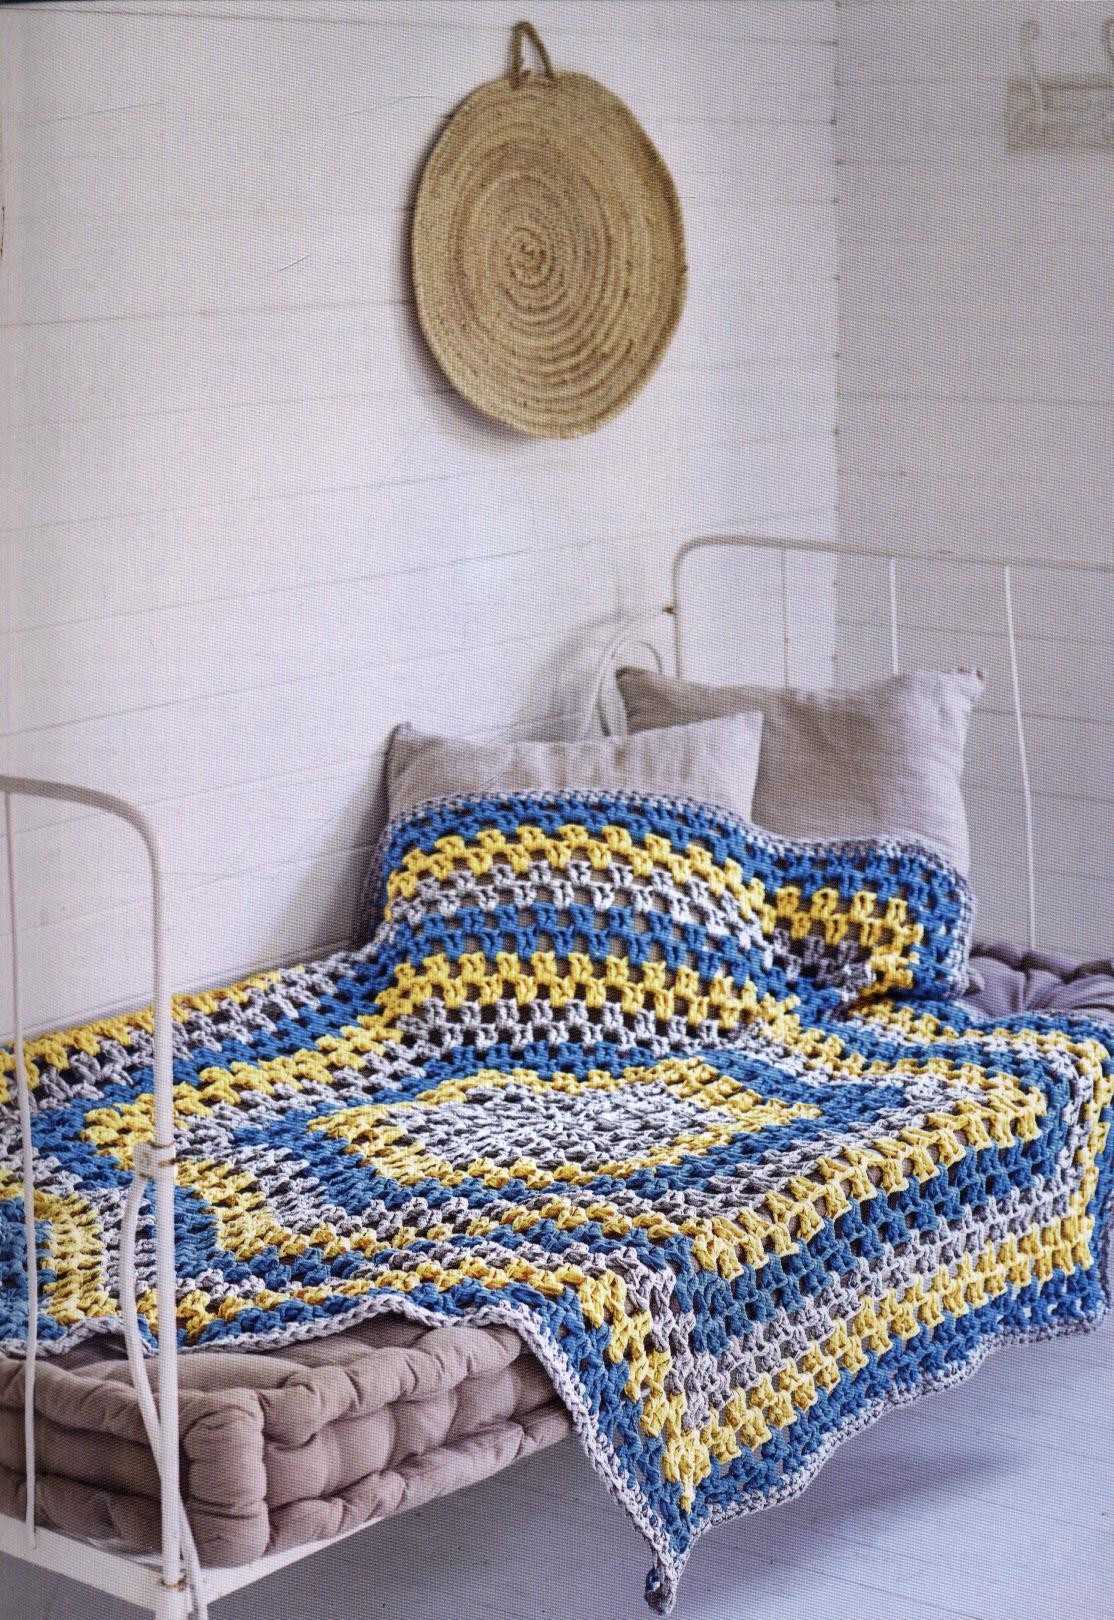 Modern crocheted blankets, throws & cushions : 35 colourful